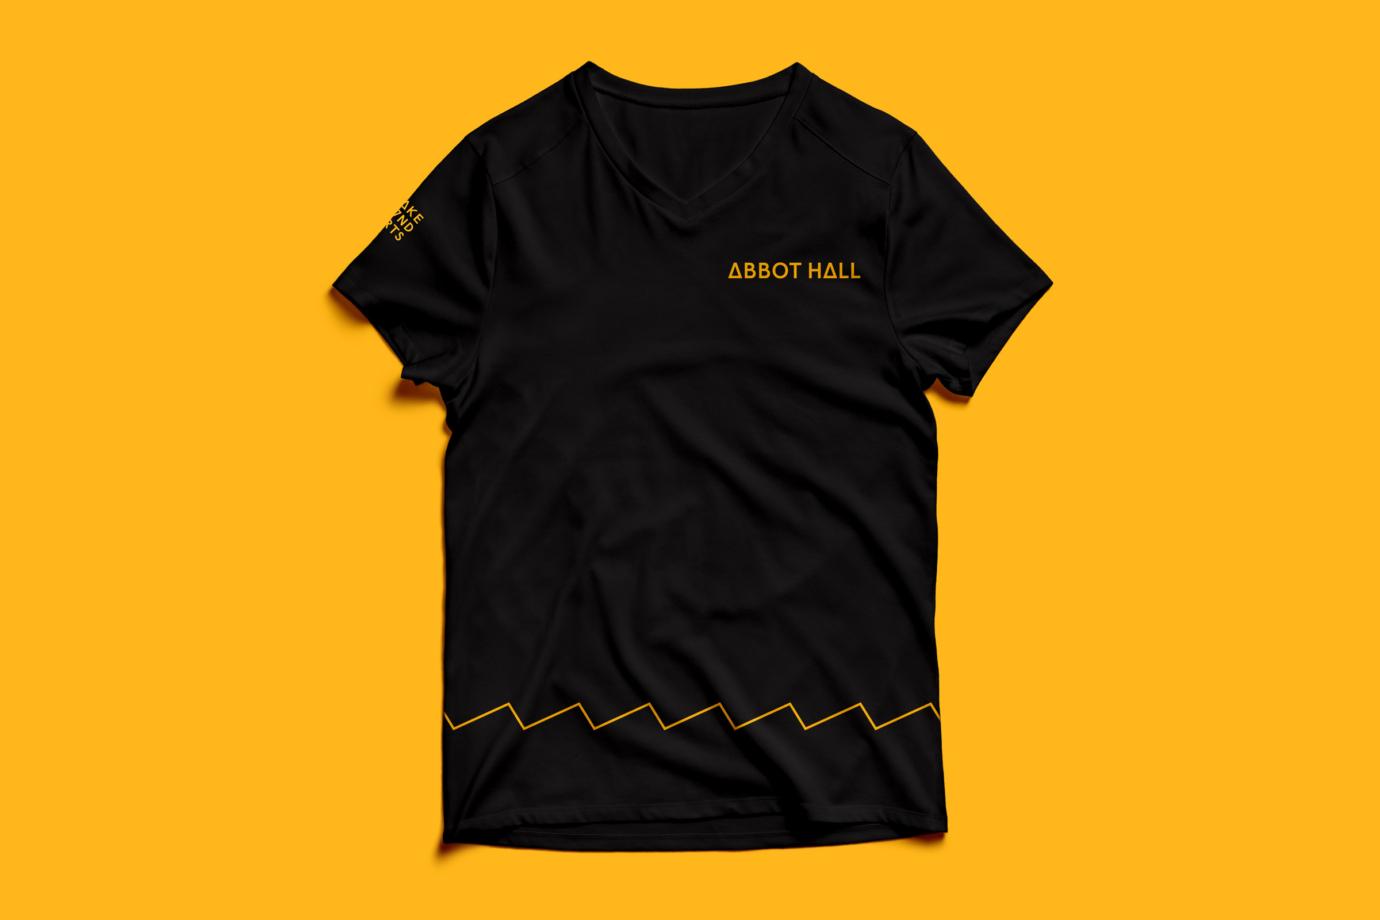 https://spystudio.co.uk/wp-content/uploads/2021/03/Lakeland_Arts_Tshirt_w-1380x920.jpg